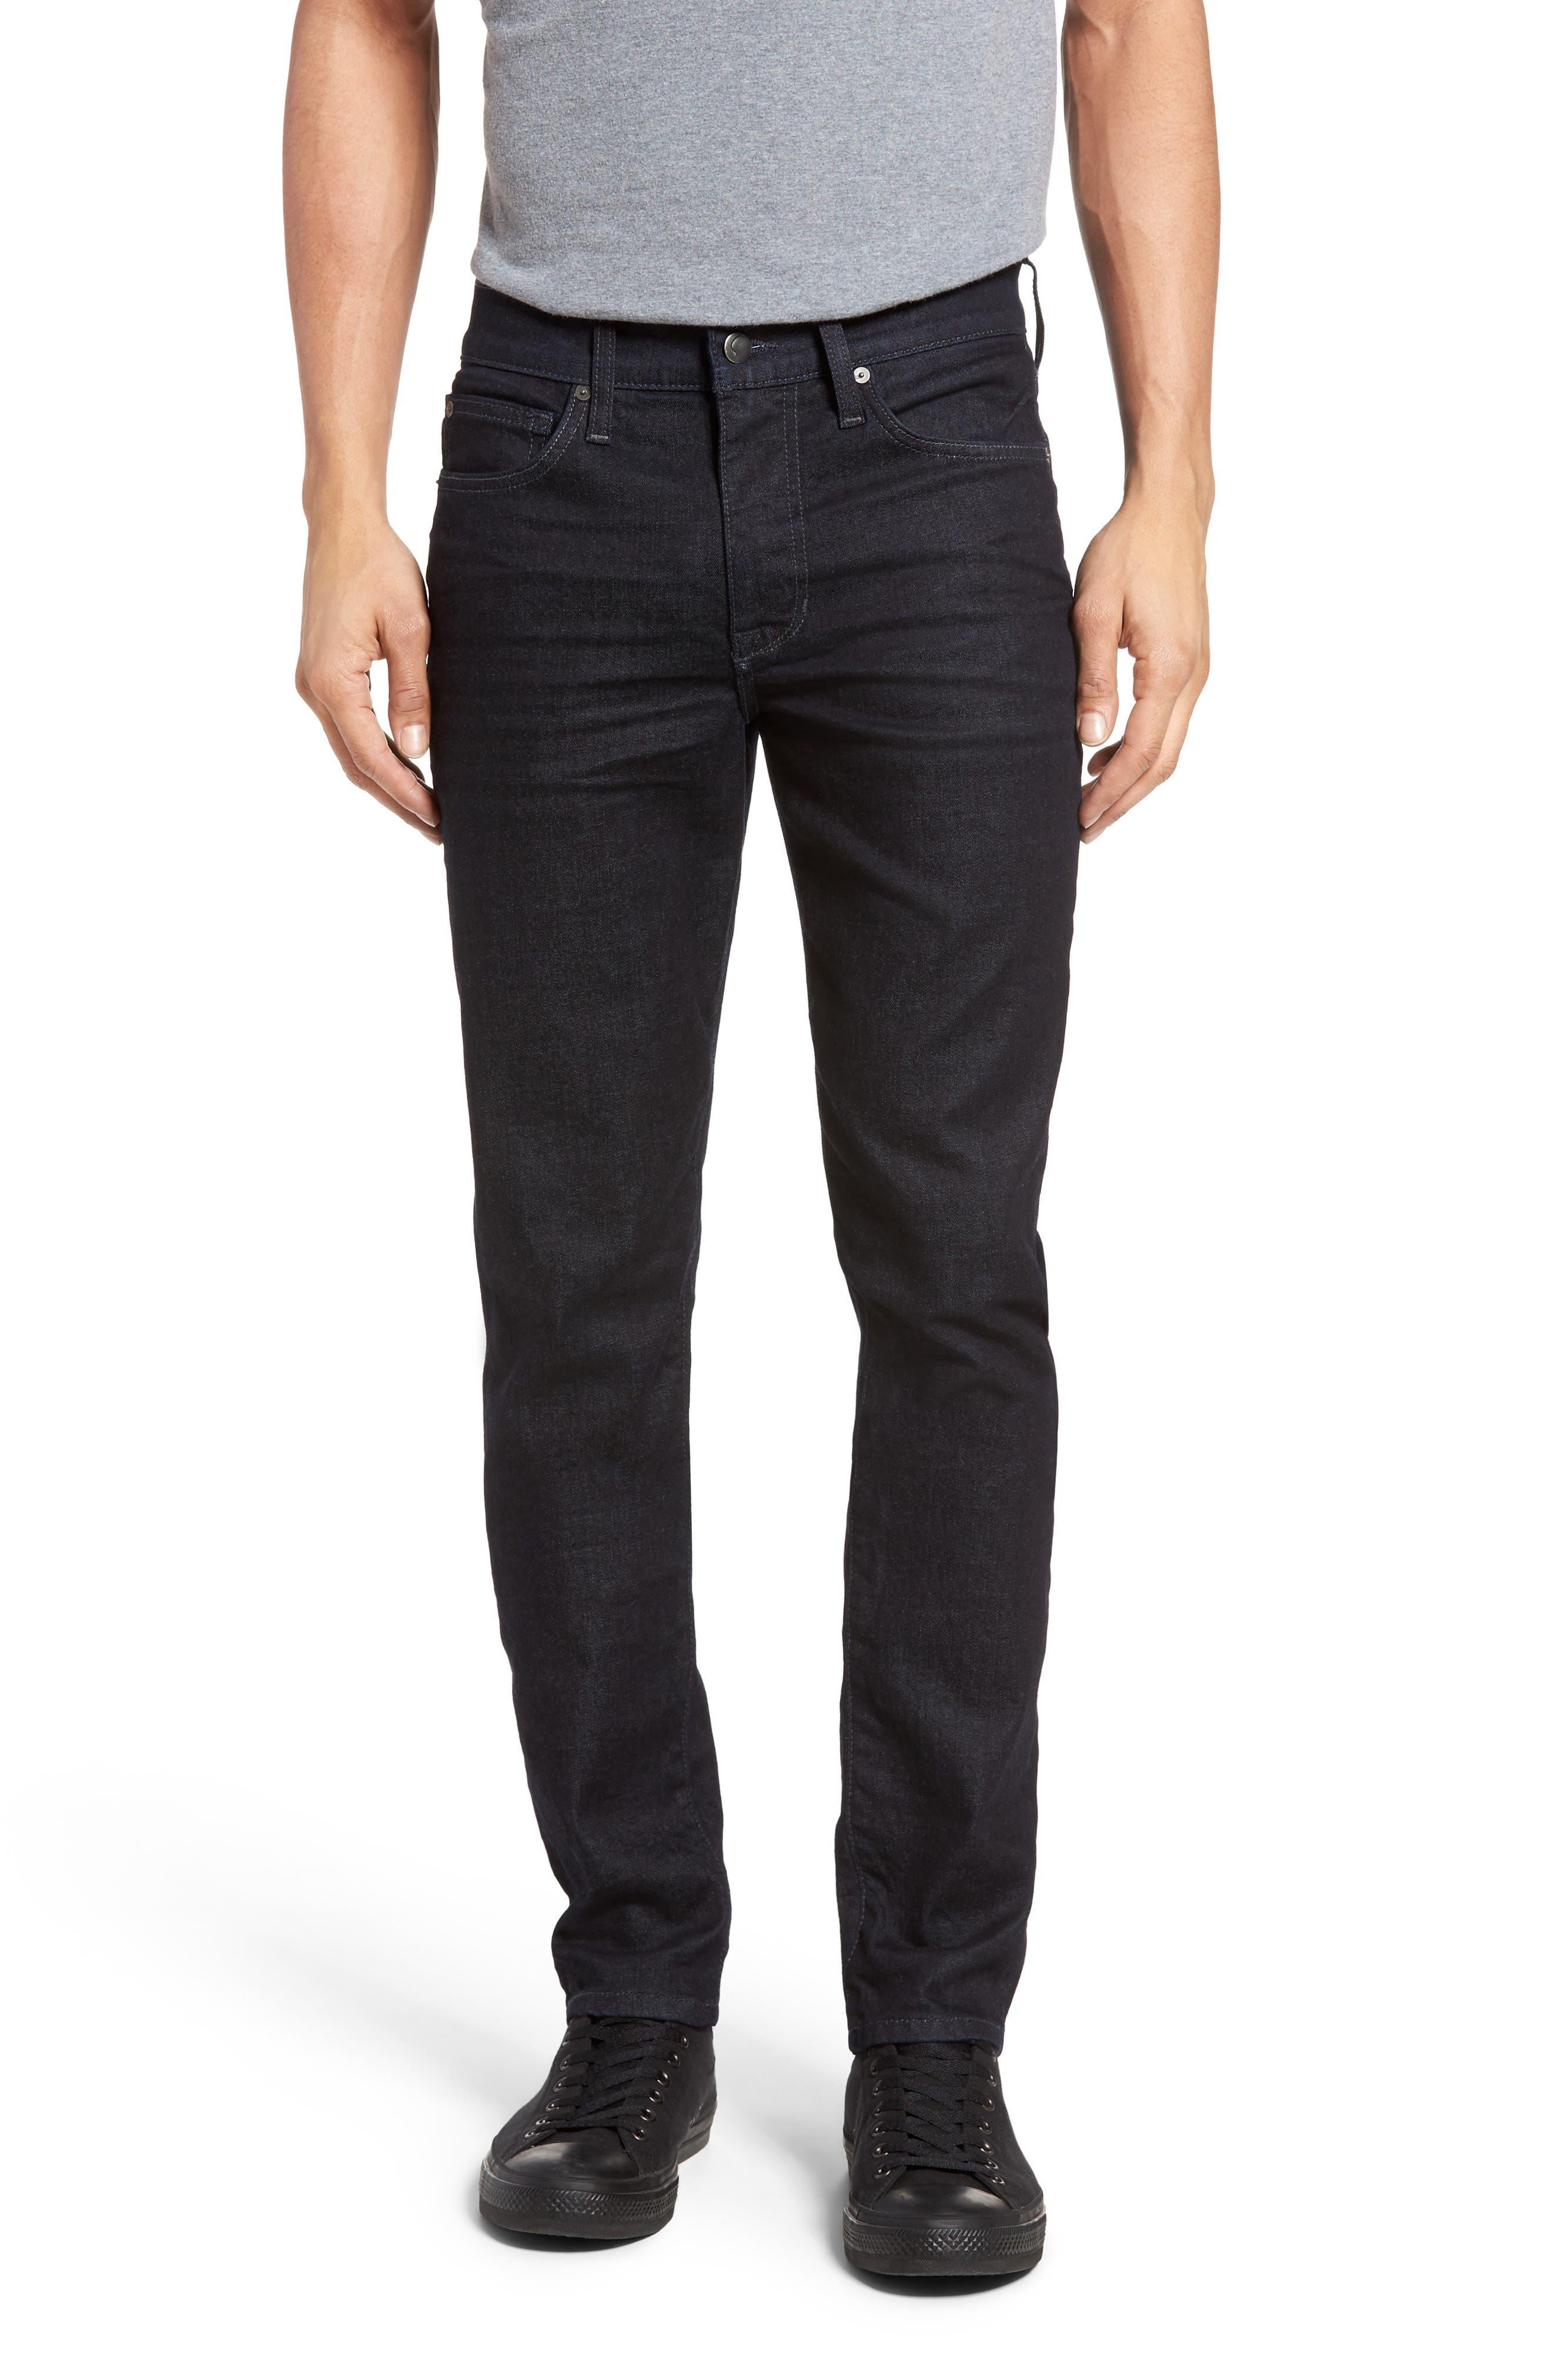 Main Image - Joe's Slim Fit Jeans (Nuhollis)